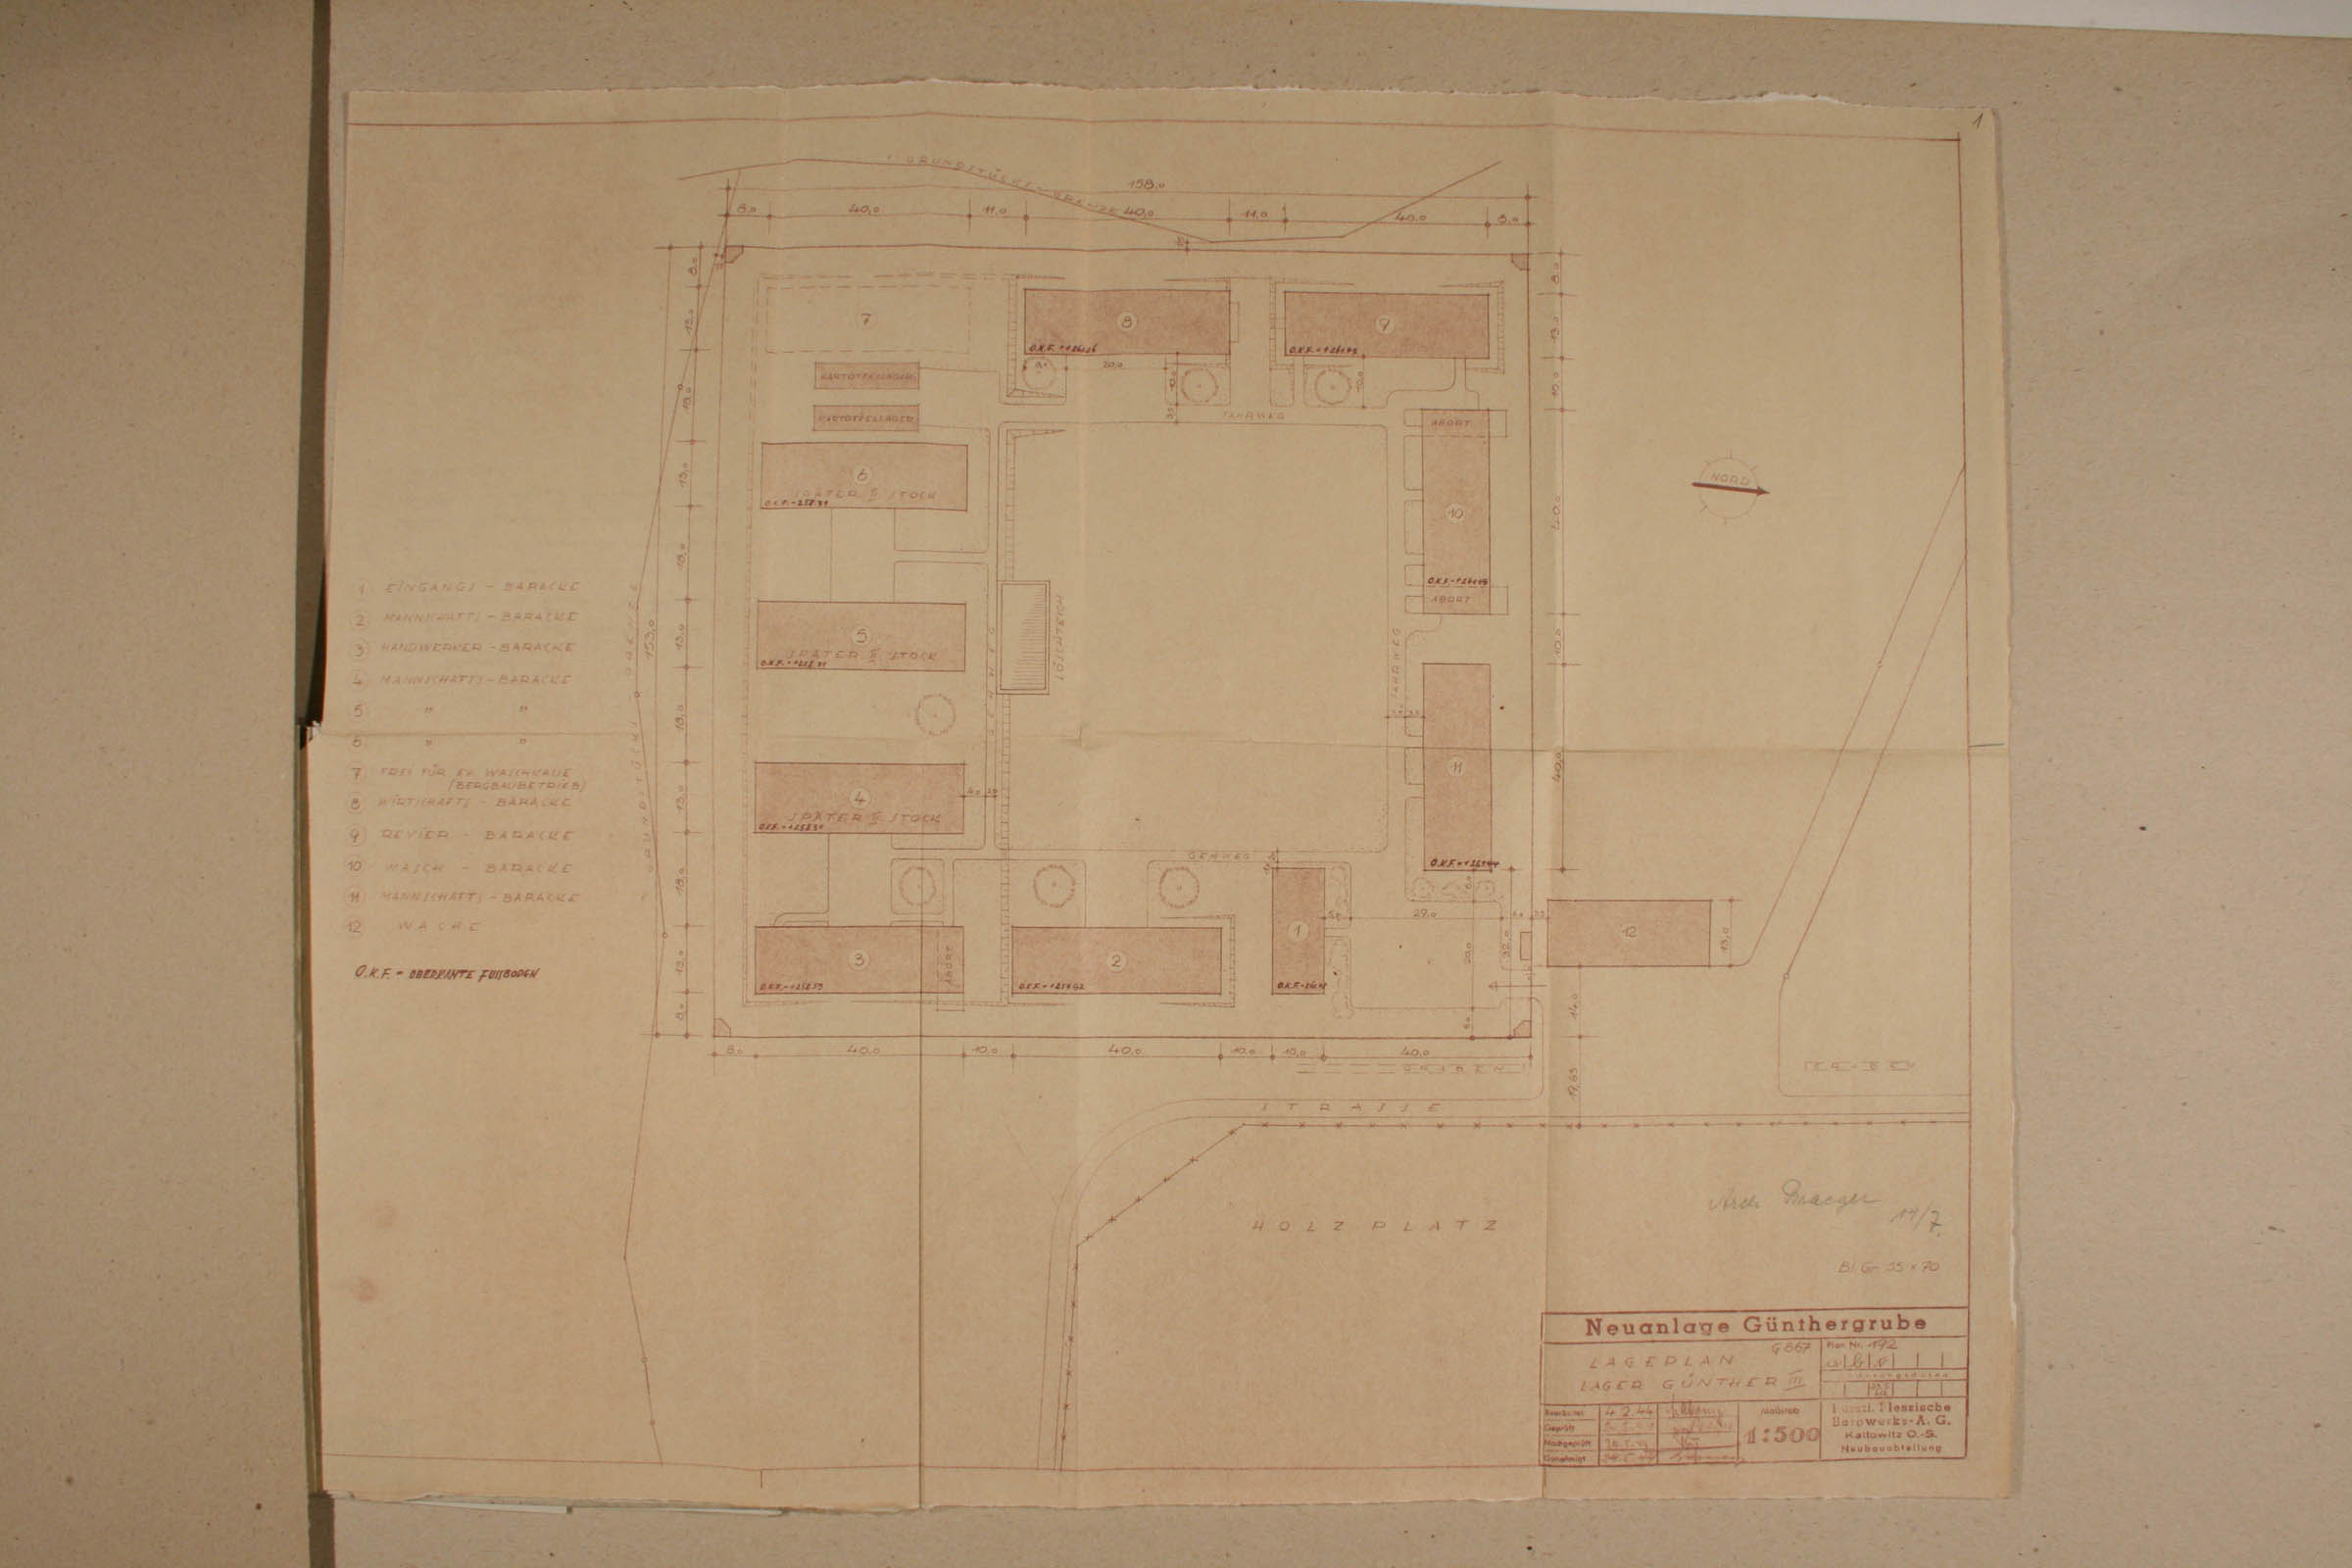 Archiwum Panstwowe w Katowicach Land Pl 12 120 708 01